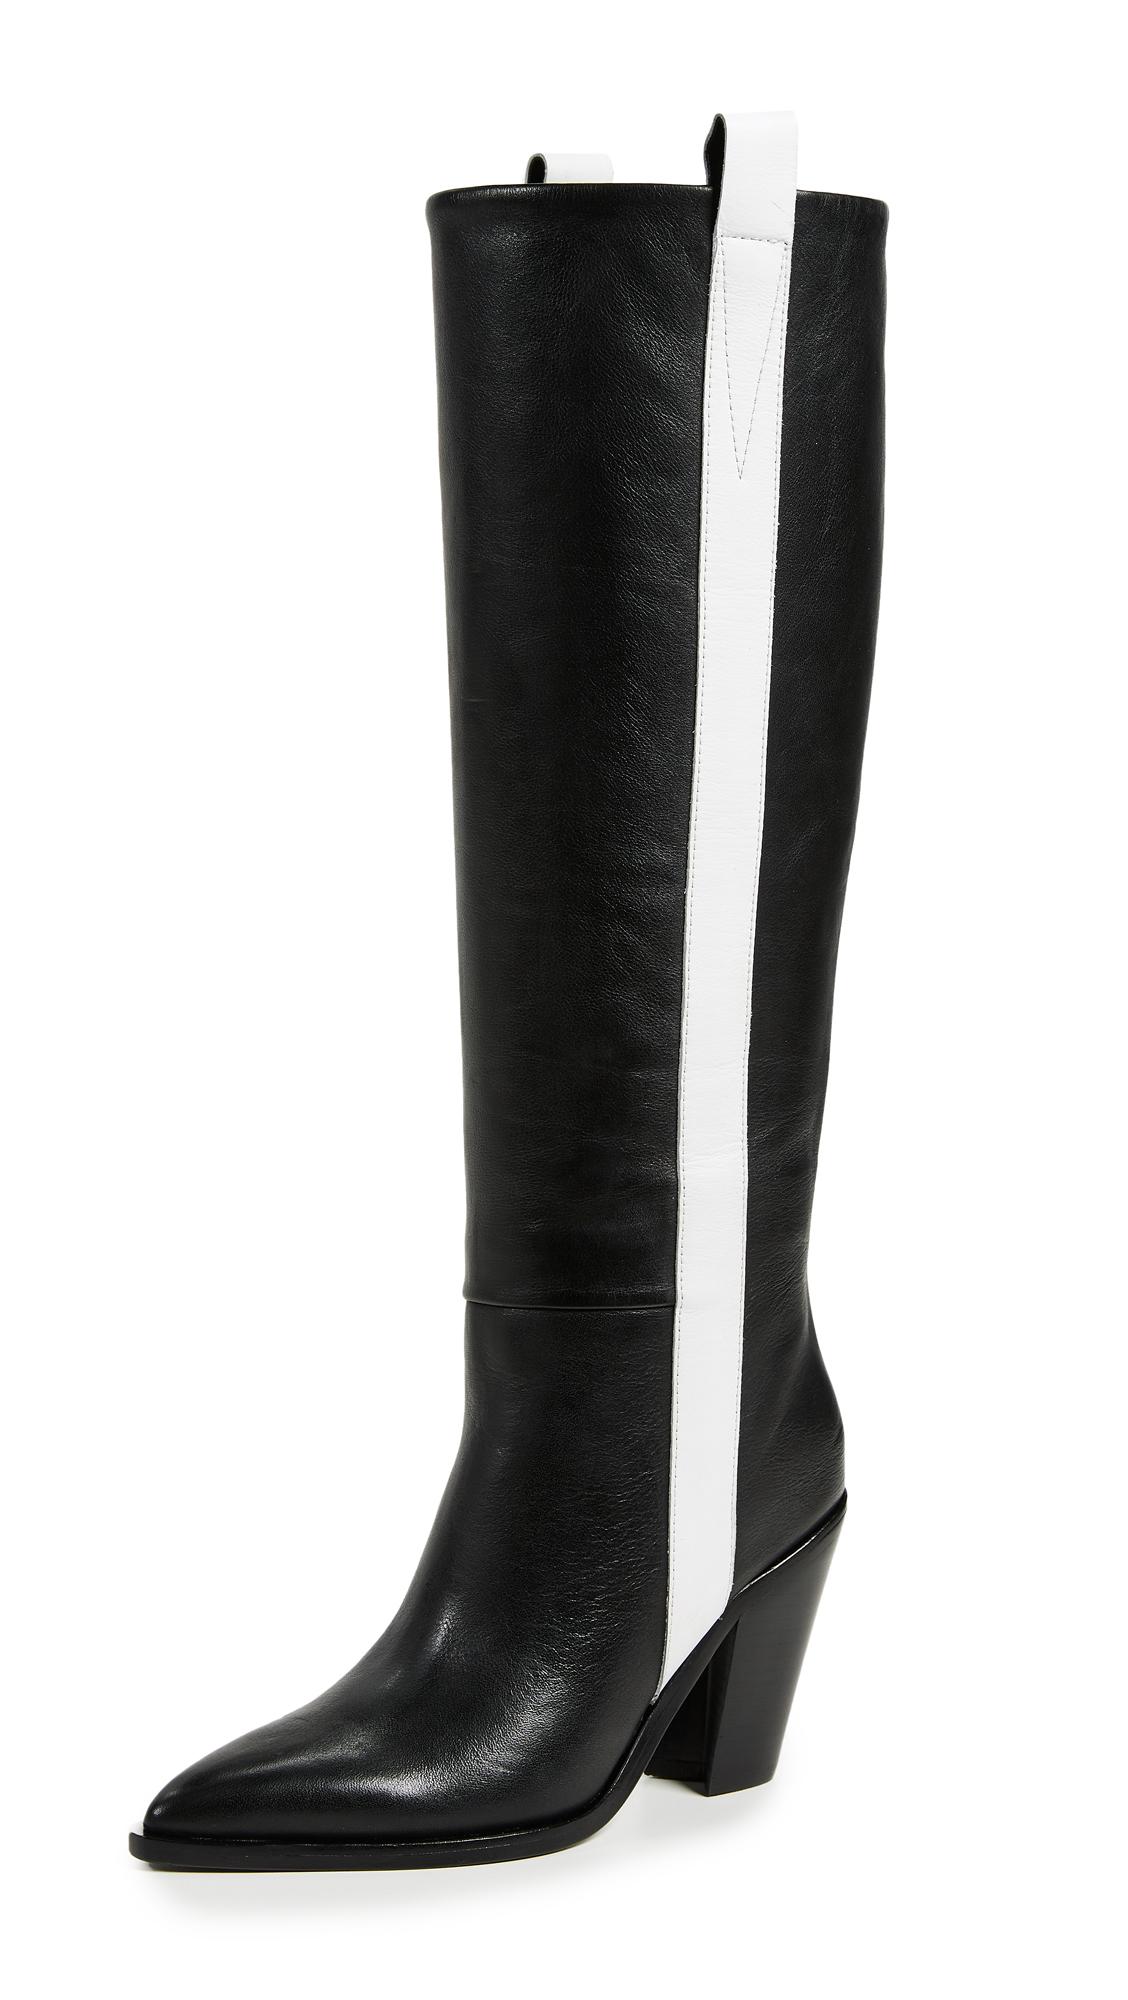 Sigerson Morrison Kaethe Boots - Black/Bianco